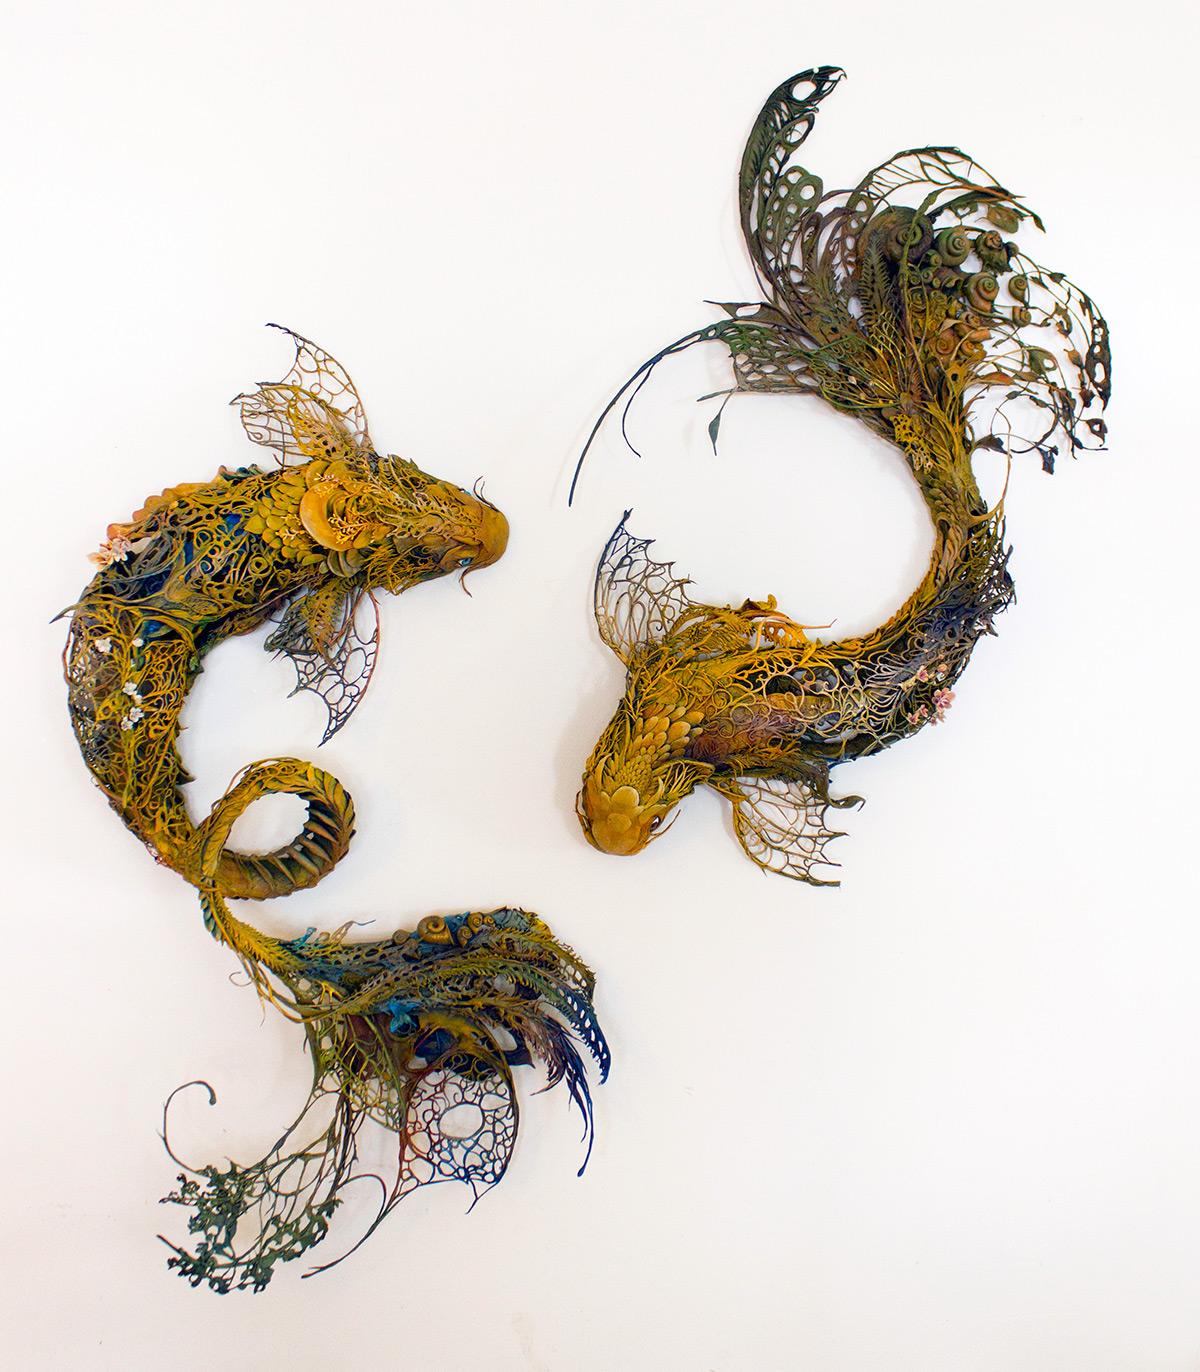 pesci-sculture-surrealiste-ellen-jewett